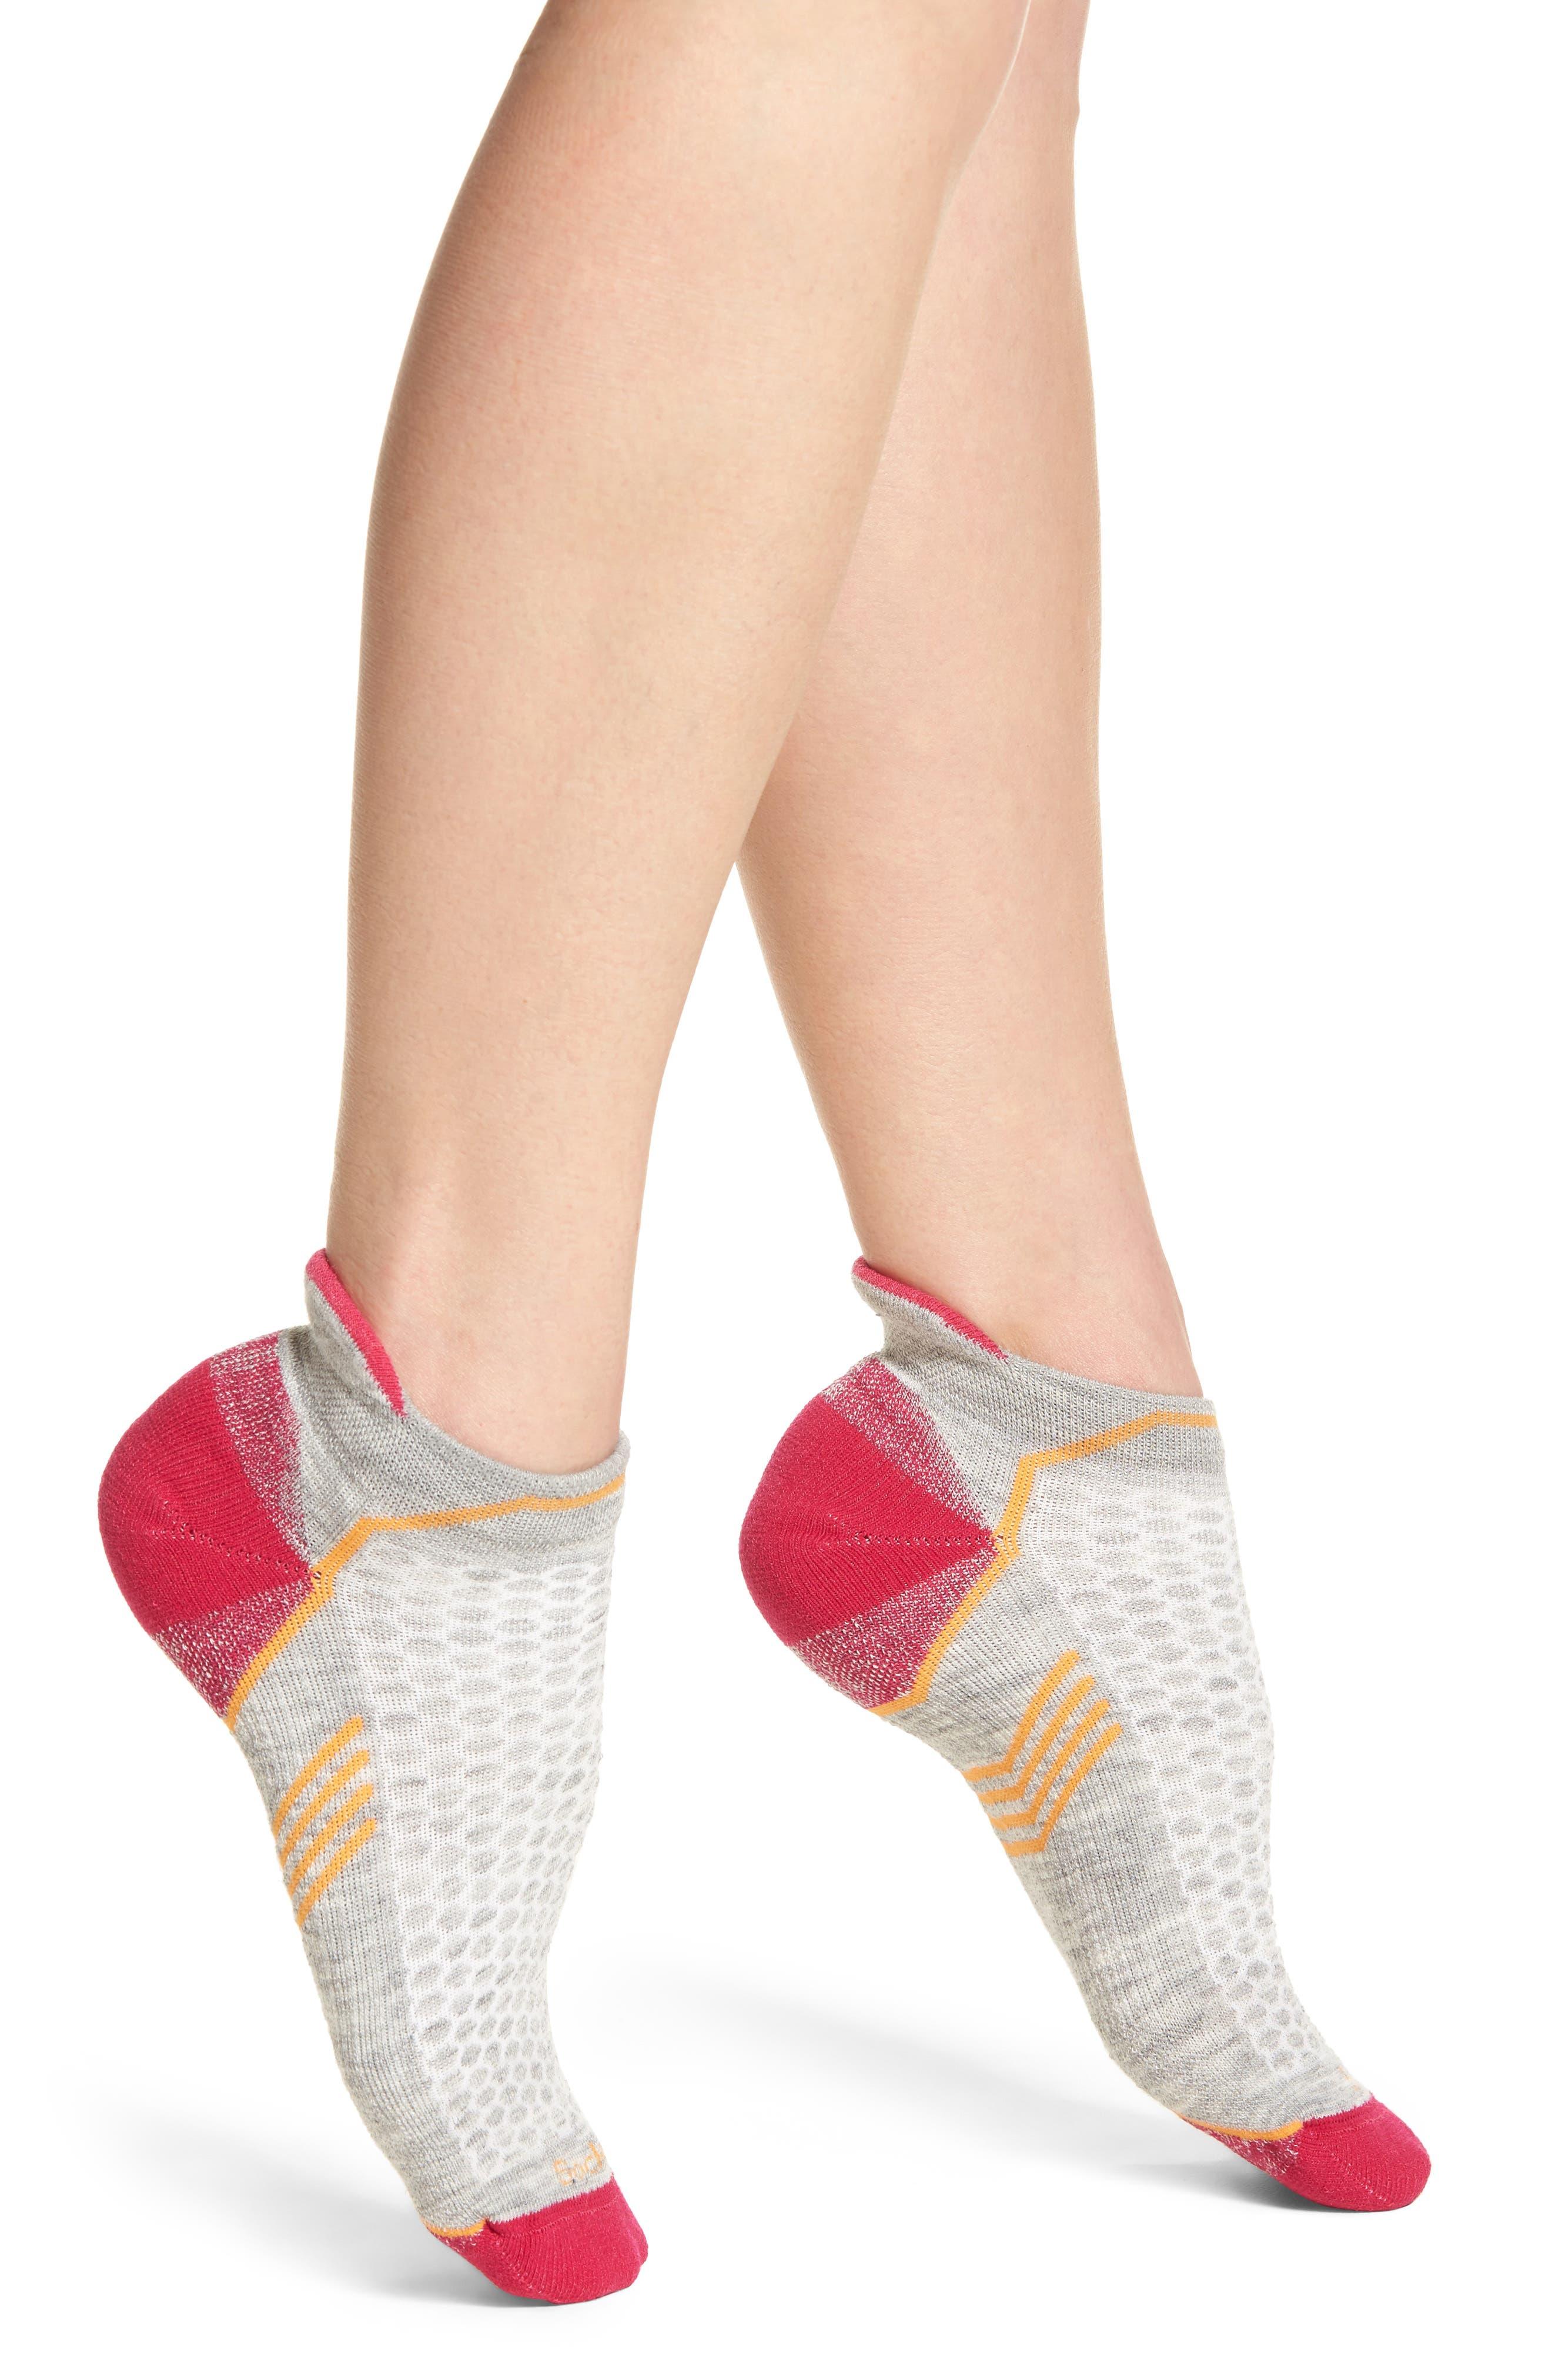 Incline Micro Compression Socks,                         Main,                         color, LIGHT GREY